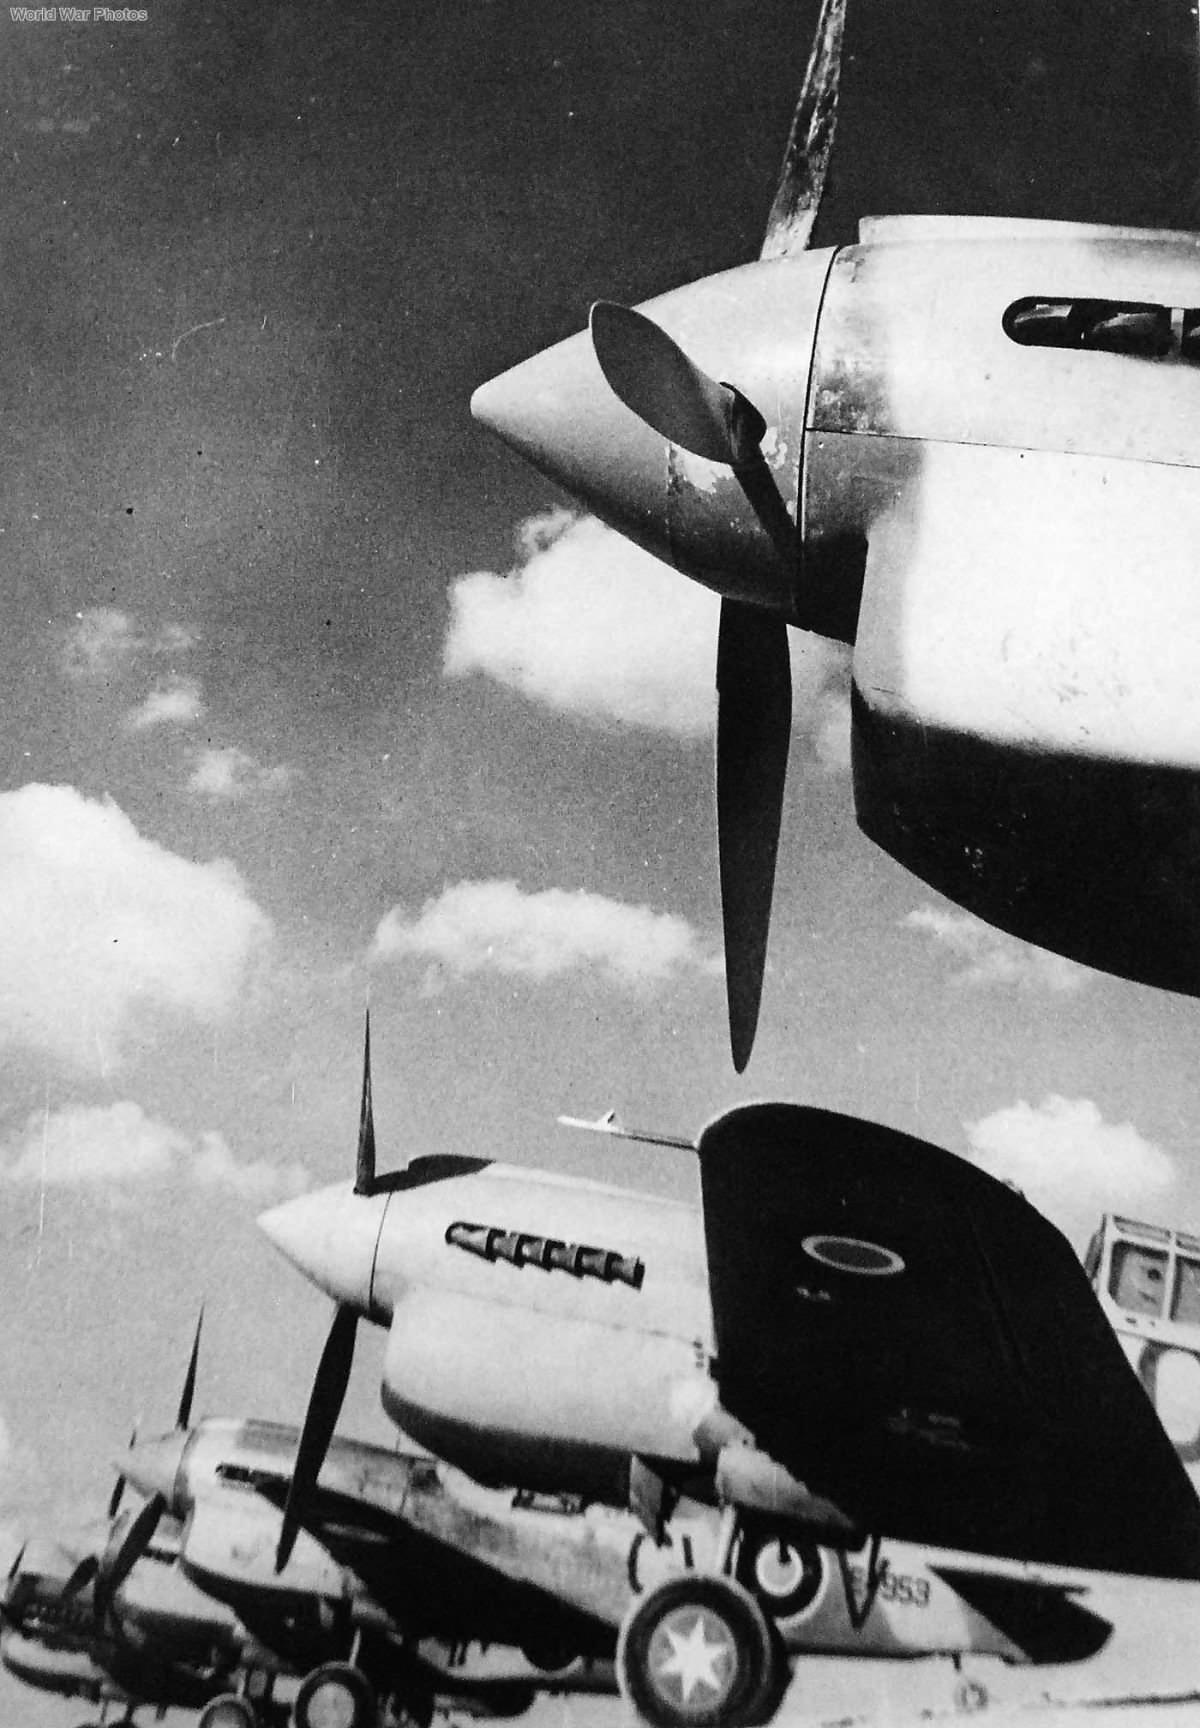 Kittyhawks of No. 3 Squadron RAAF